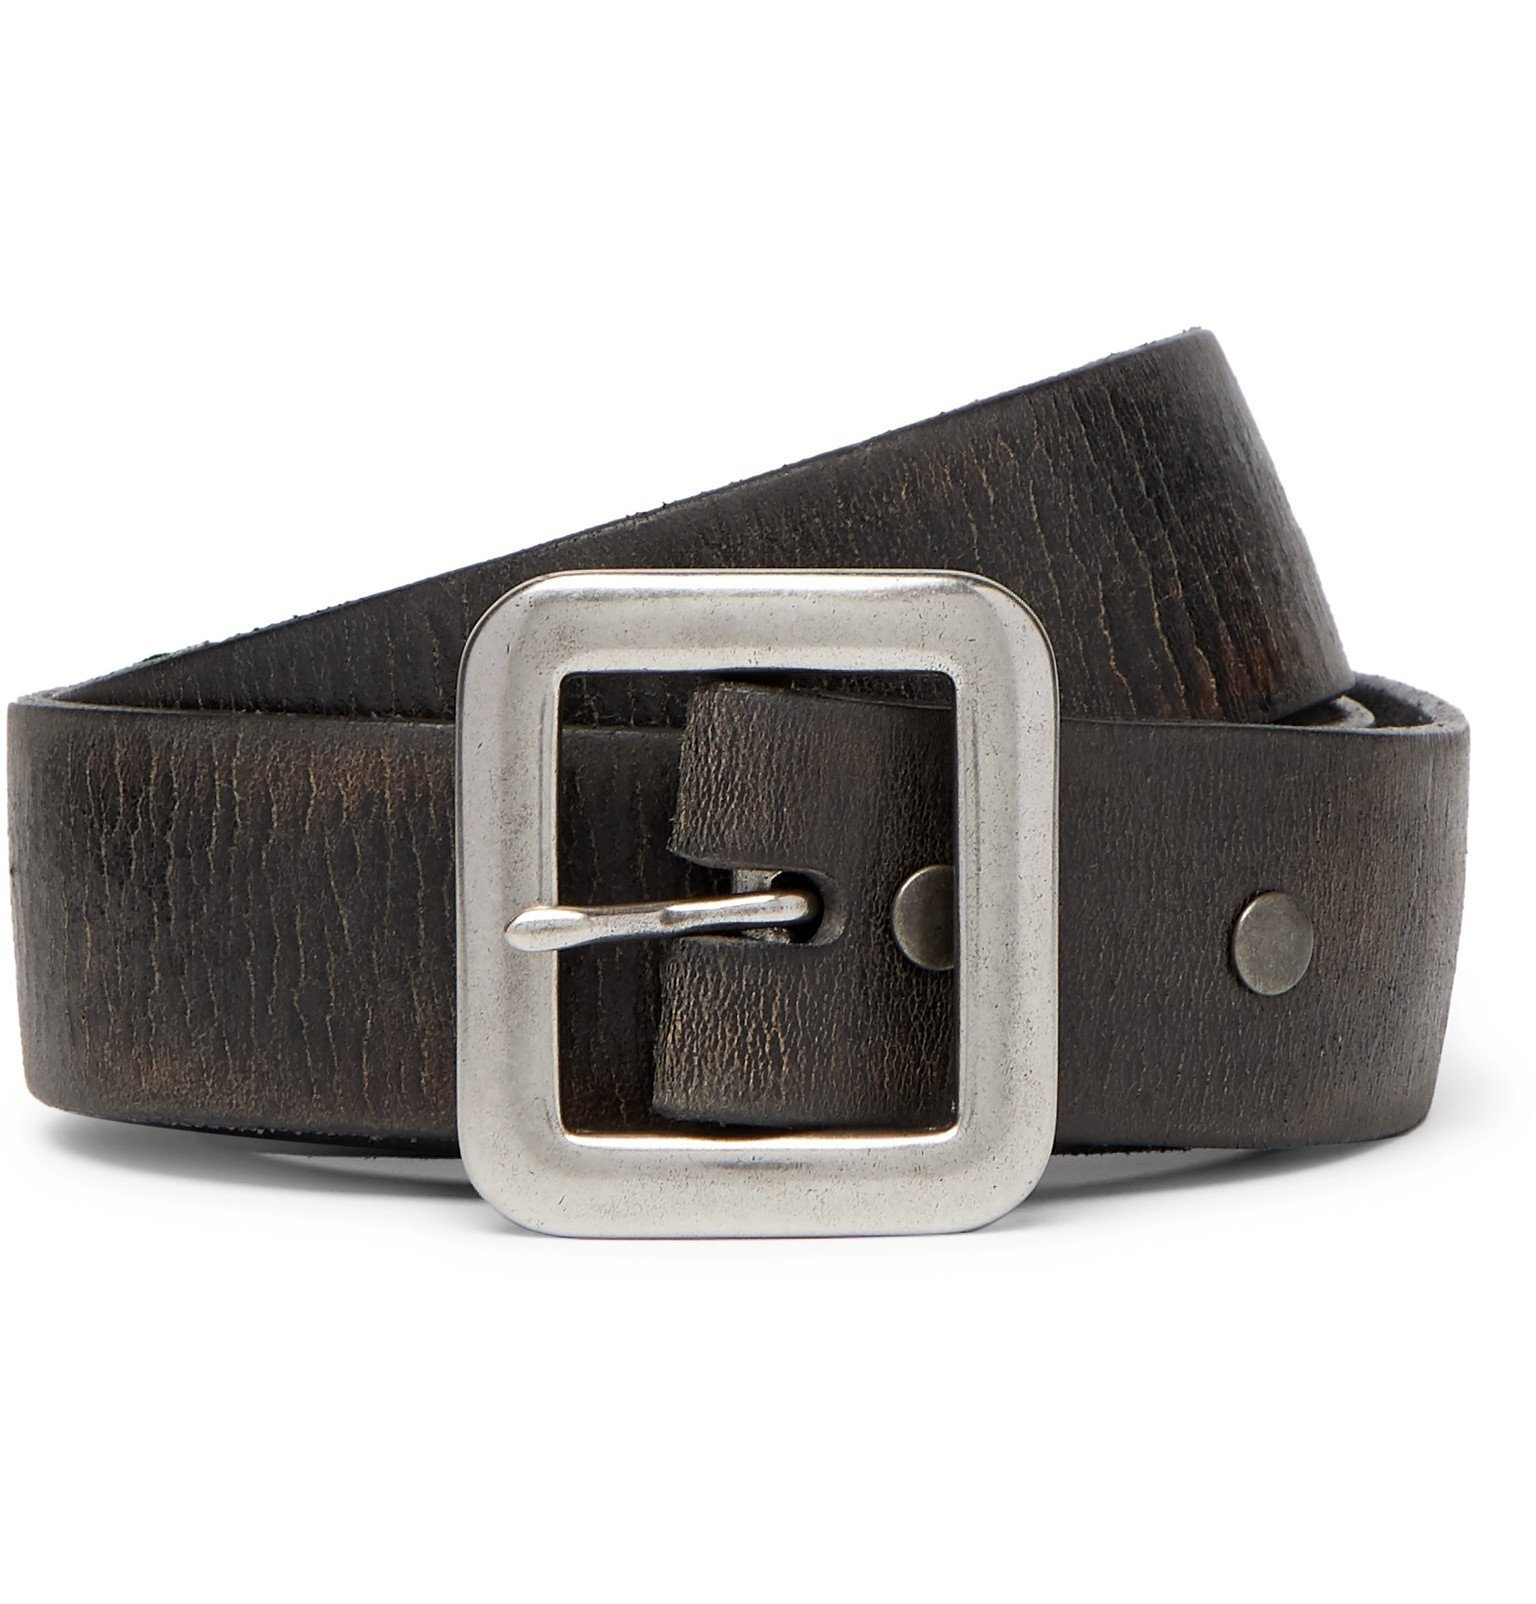 RRL - 3.5cm New Burlington Tumbled-Leather Belt - Black